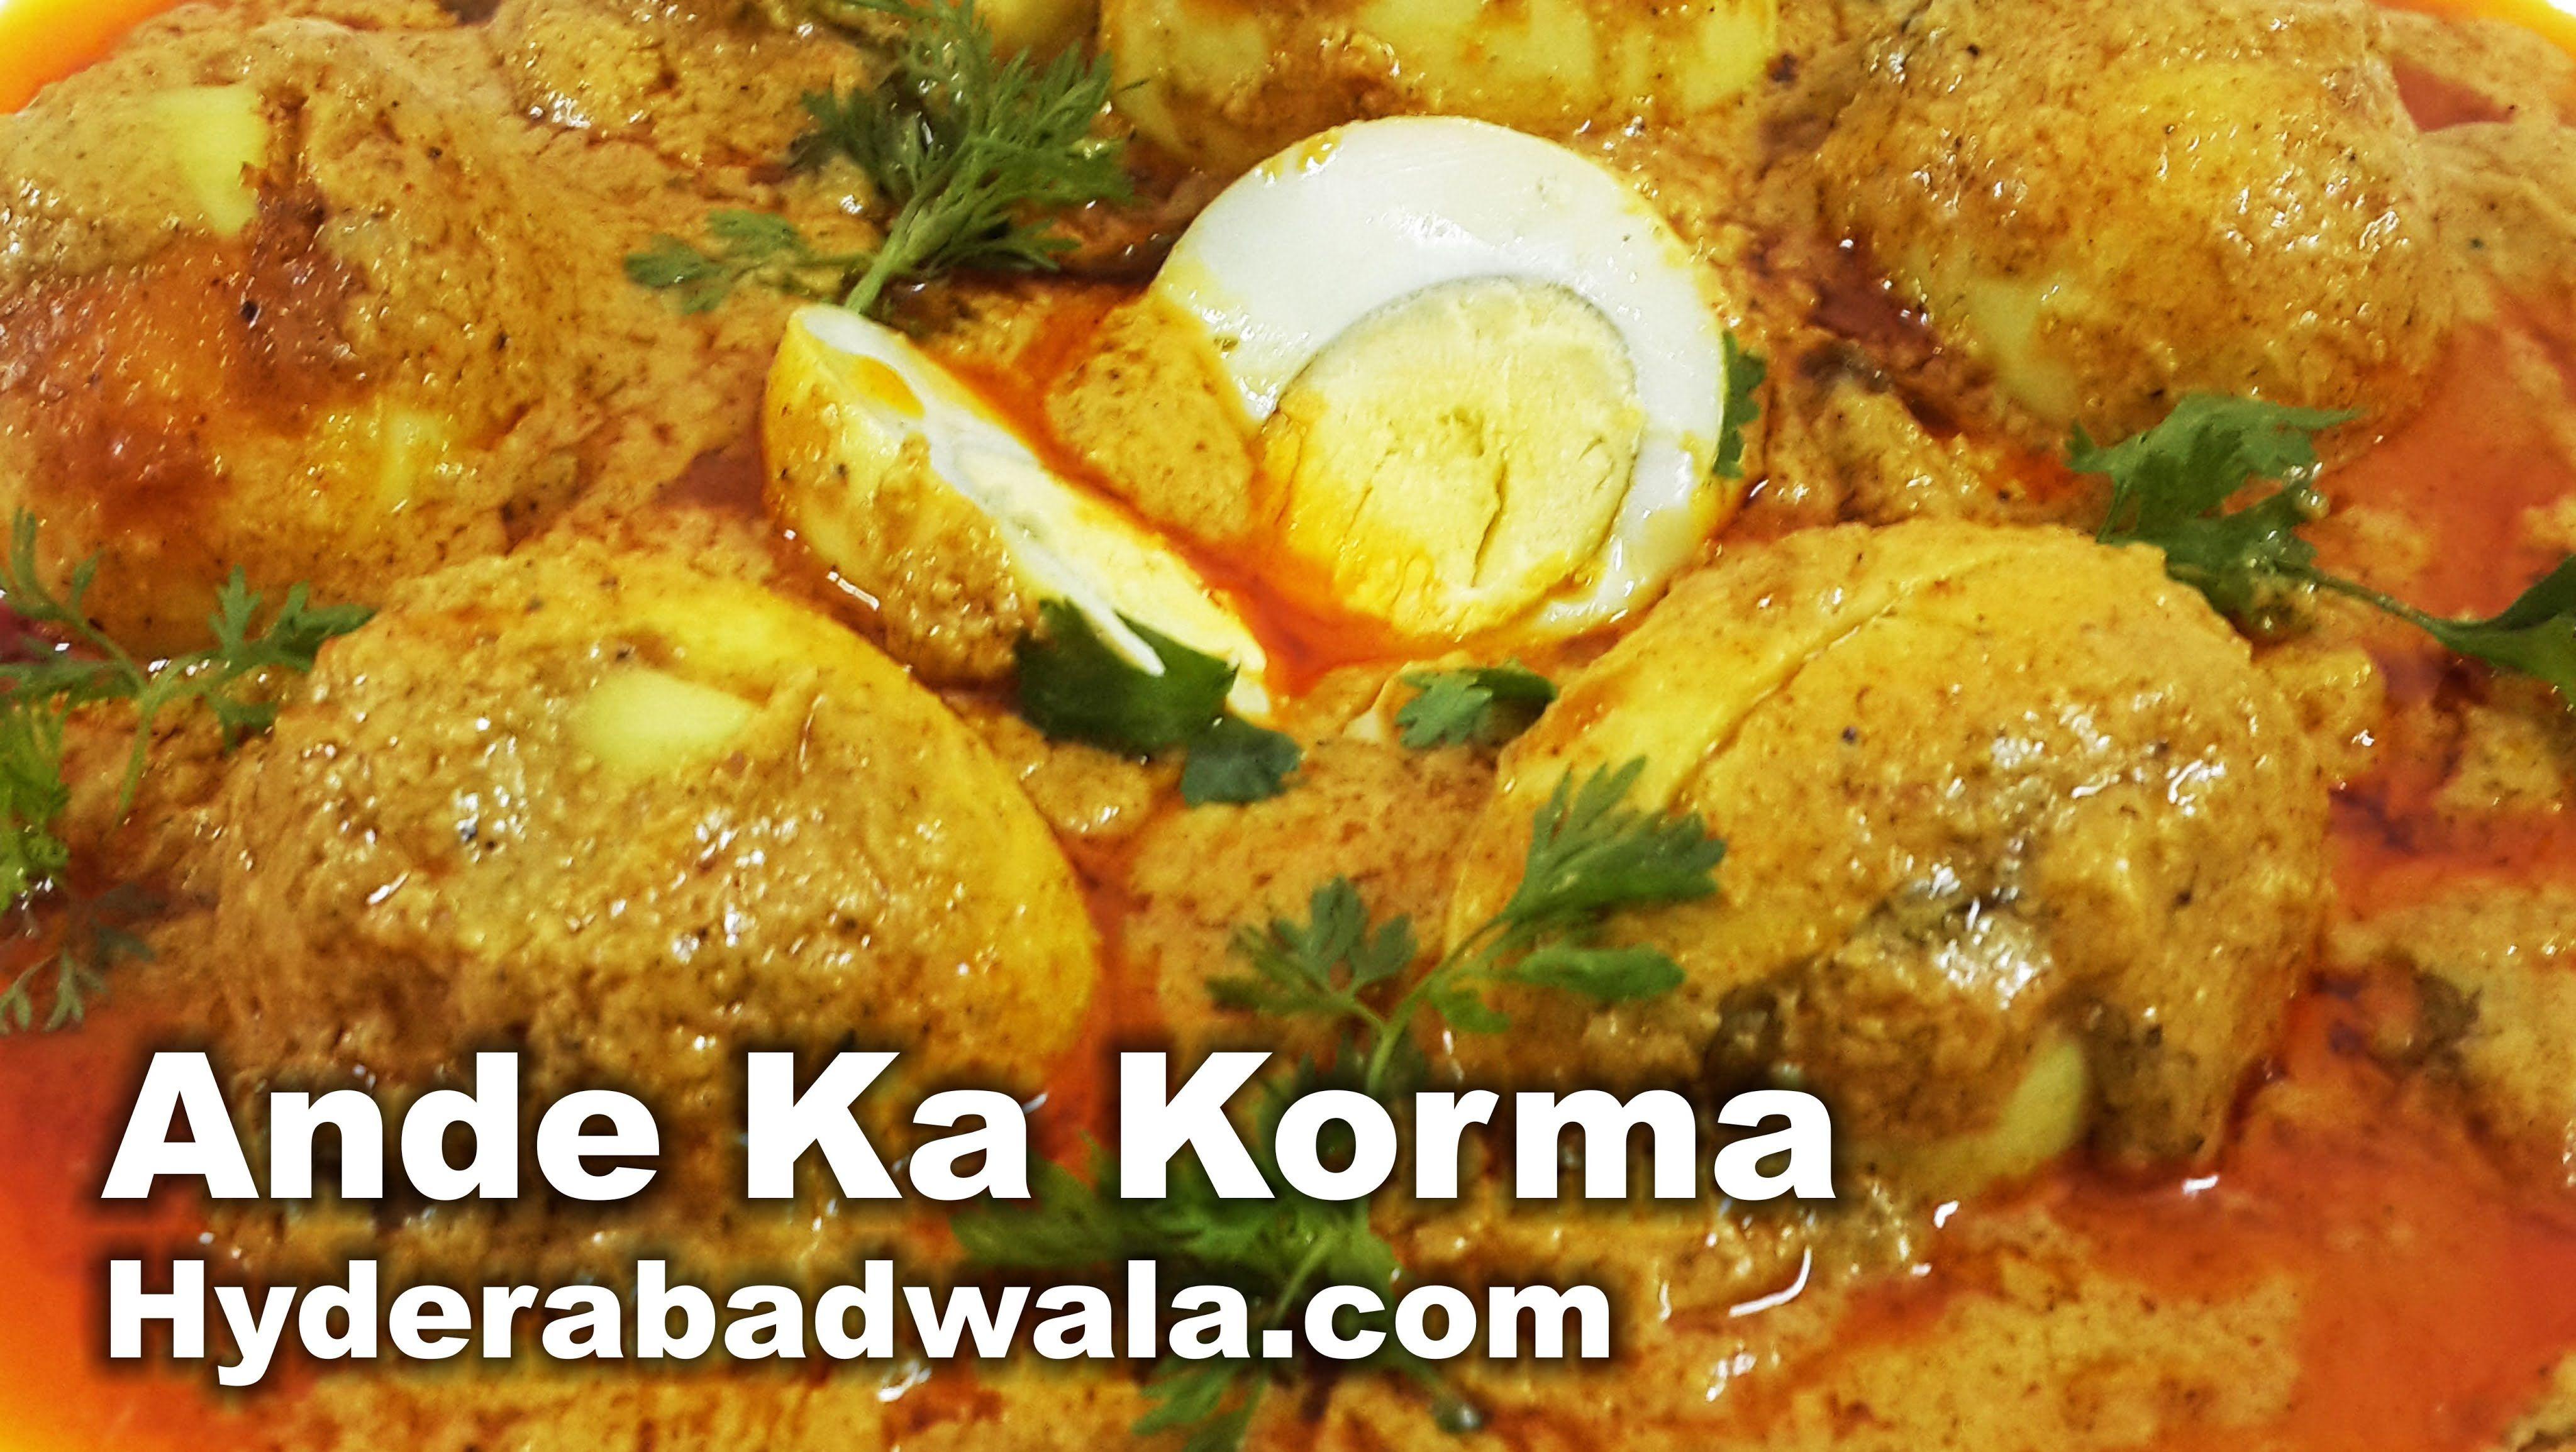 Ande ka korma recipe video hyderabadi egg masala curry at home food ande ka korma recipe video forumfinder Images